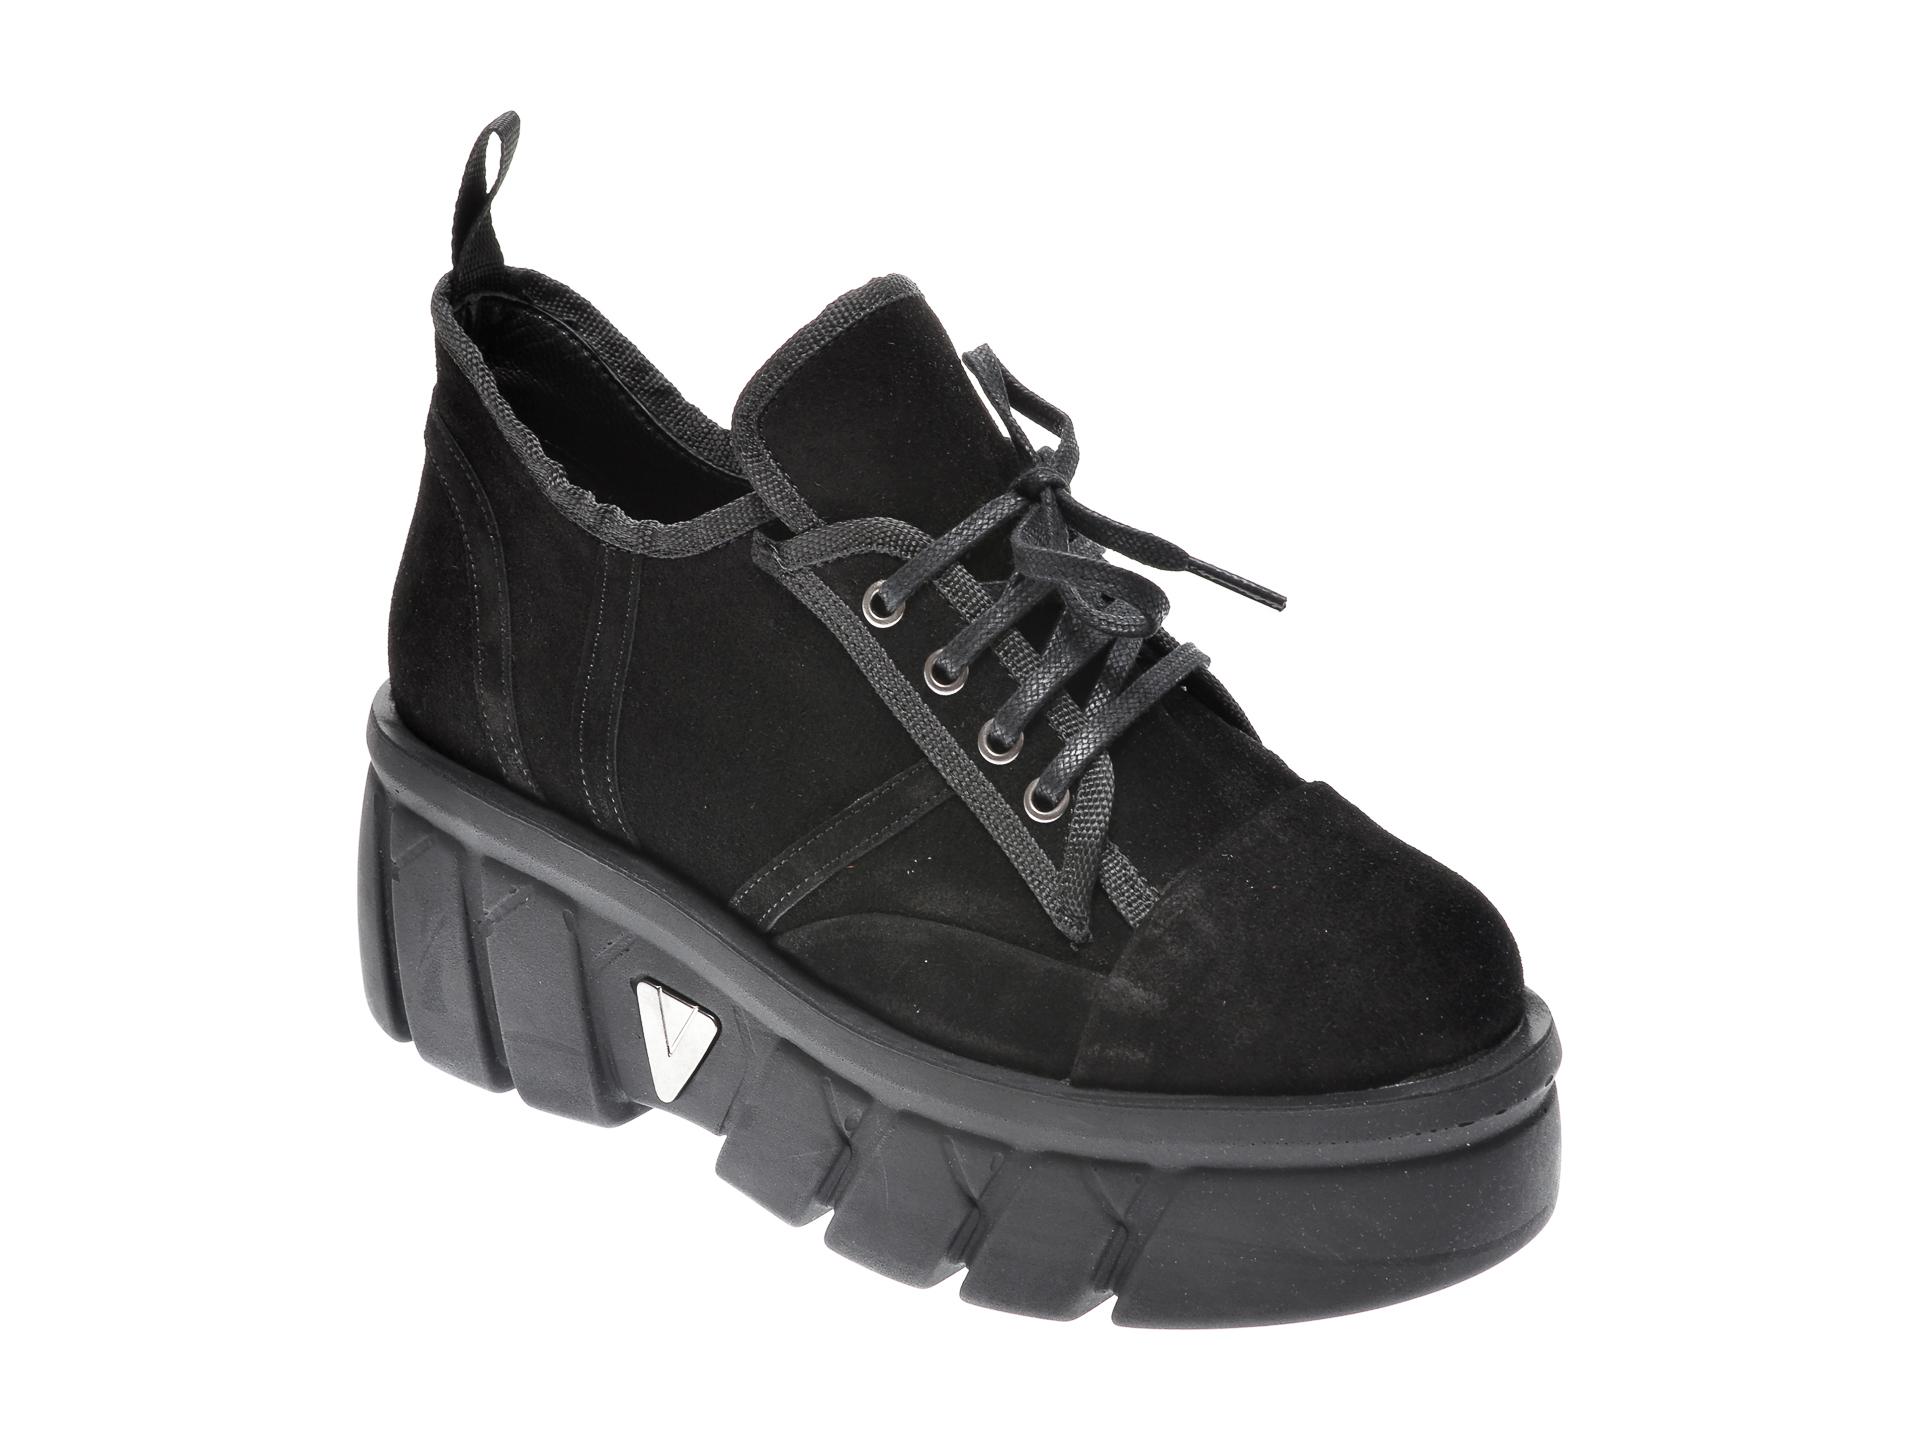 Pantofi FLAVIA PASSINI negri, Z8552, din piele intoarsa imagine